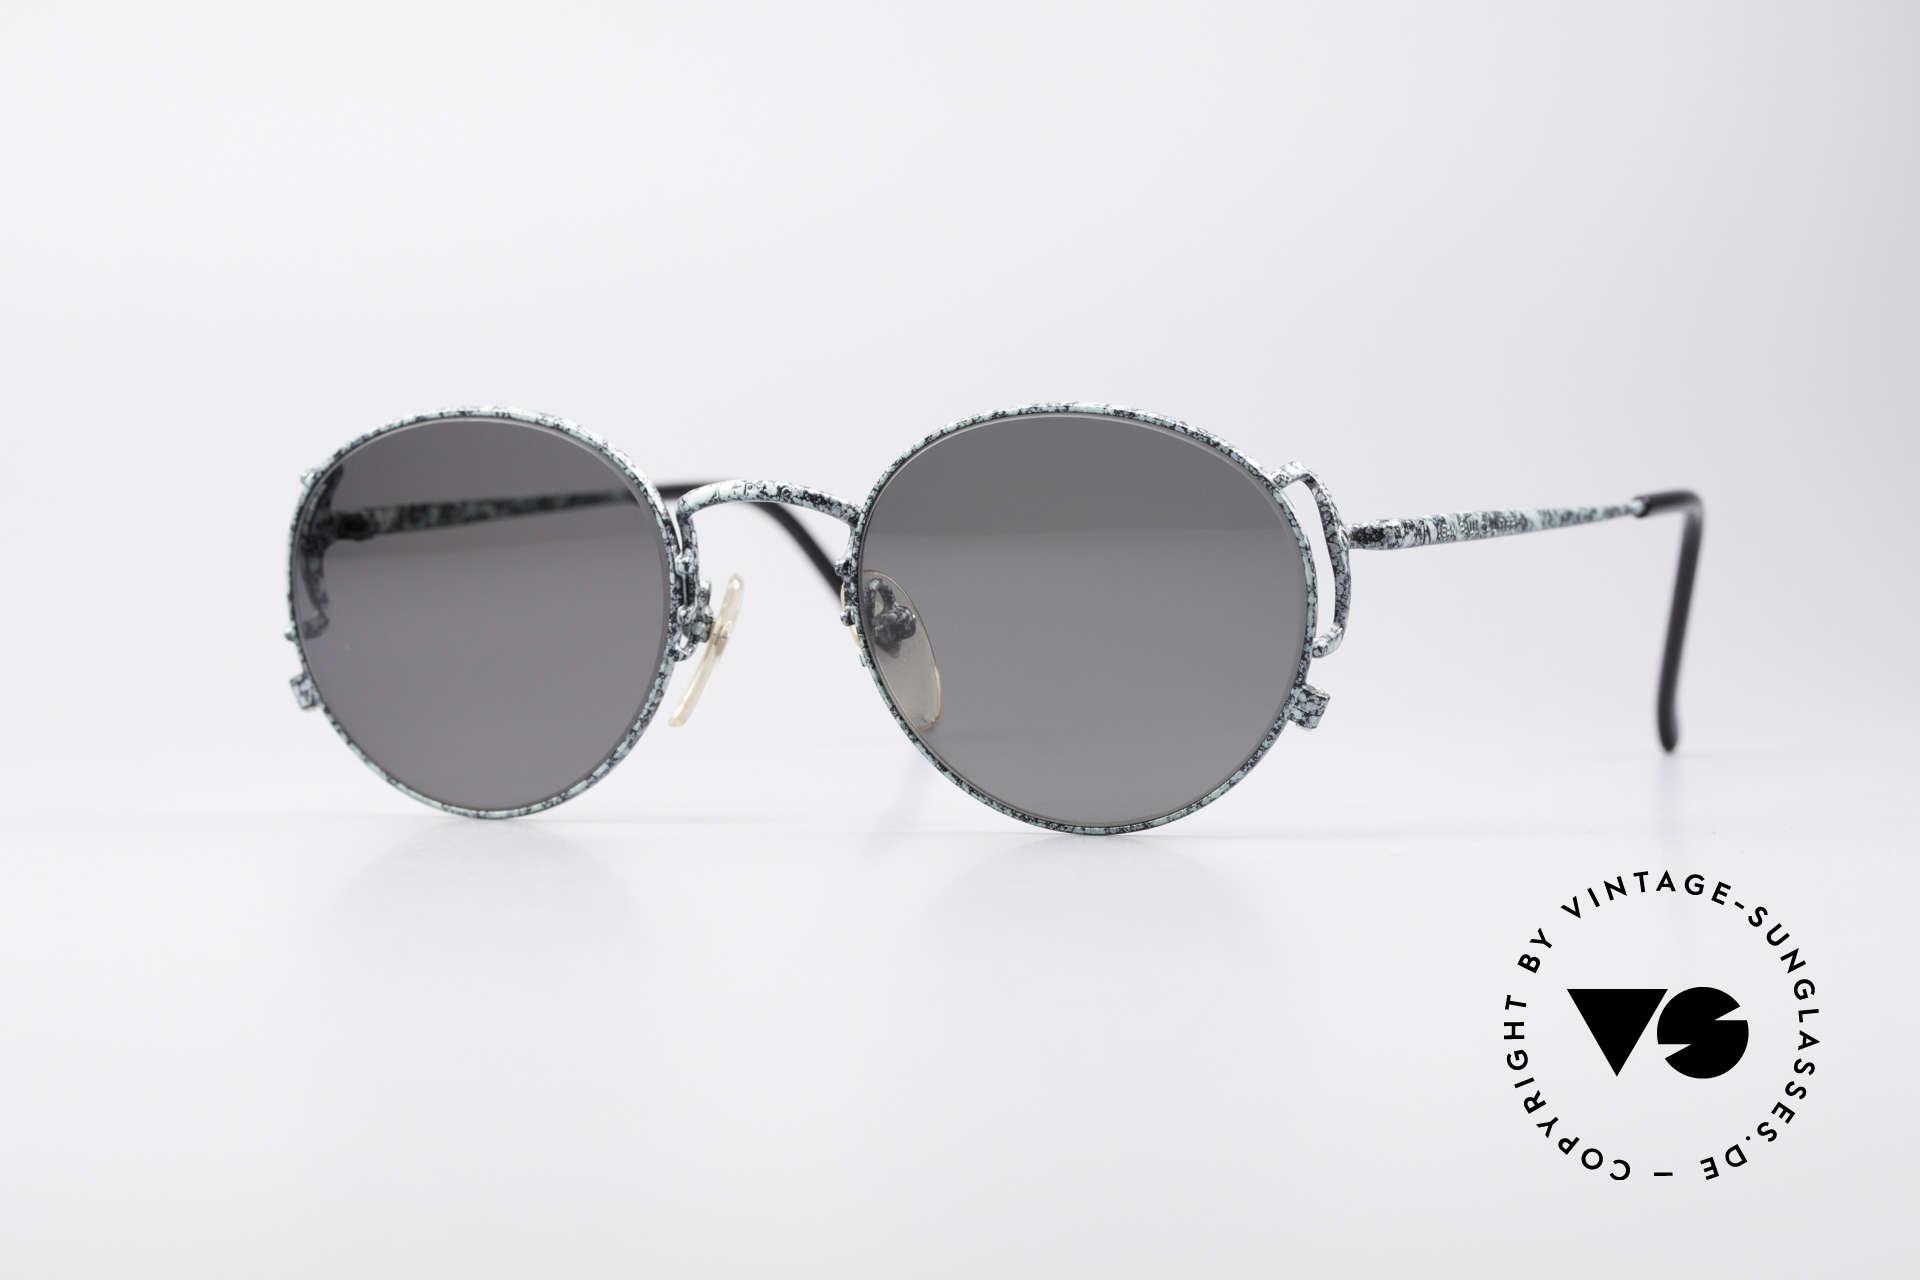 Jean Paul Gaultier 55-3178 Polarized JPG Sunglasses, noble Jean Paul GAULTIER 90's designer shades, Made for Men and Women